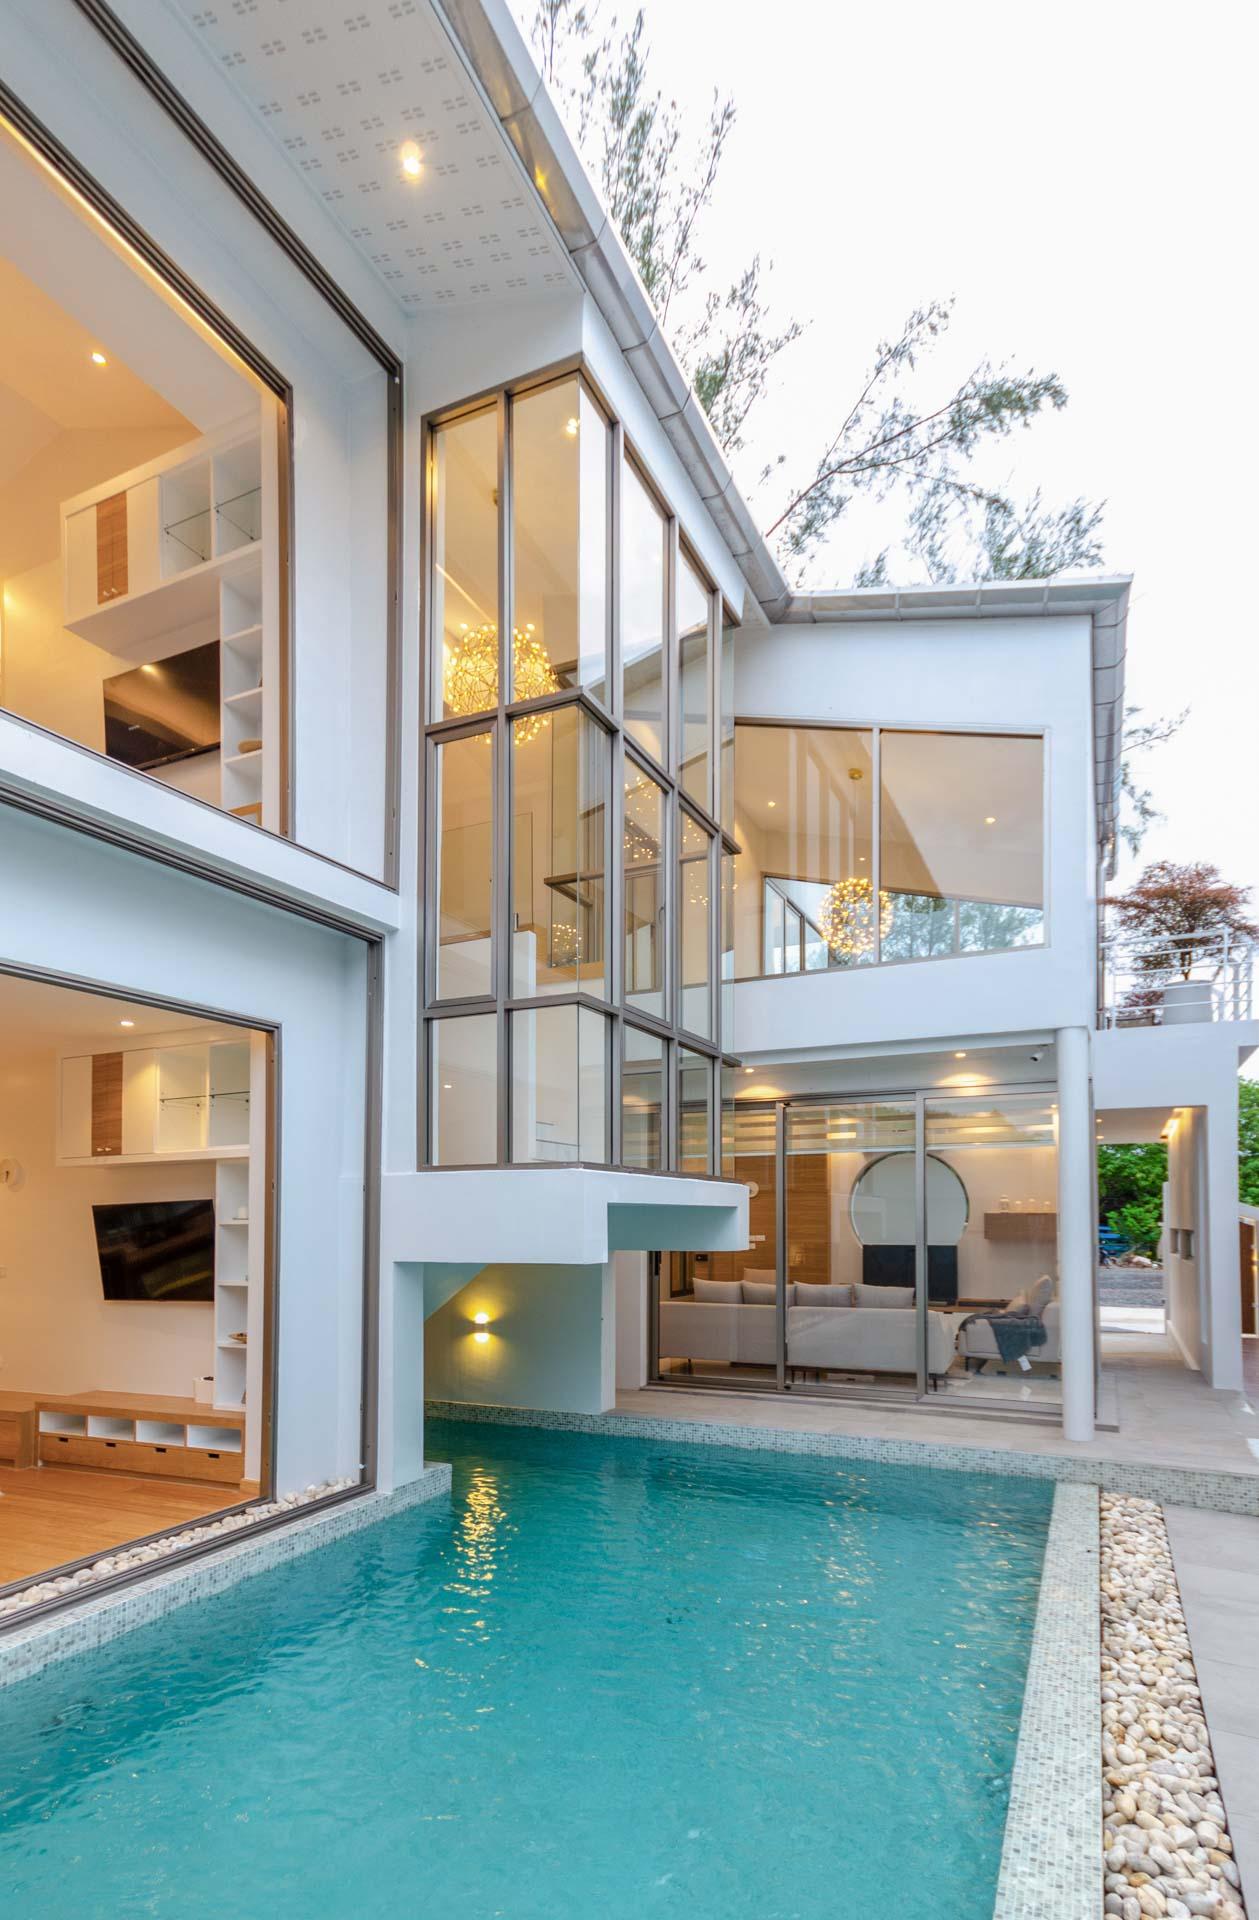 Exterior : The Element villa by Wallaya villas